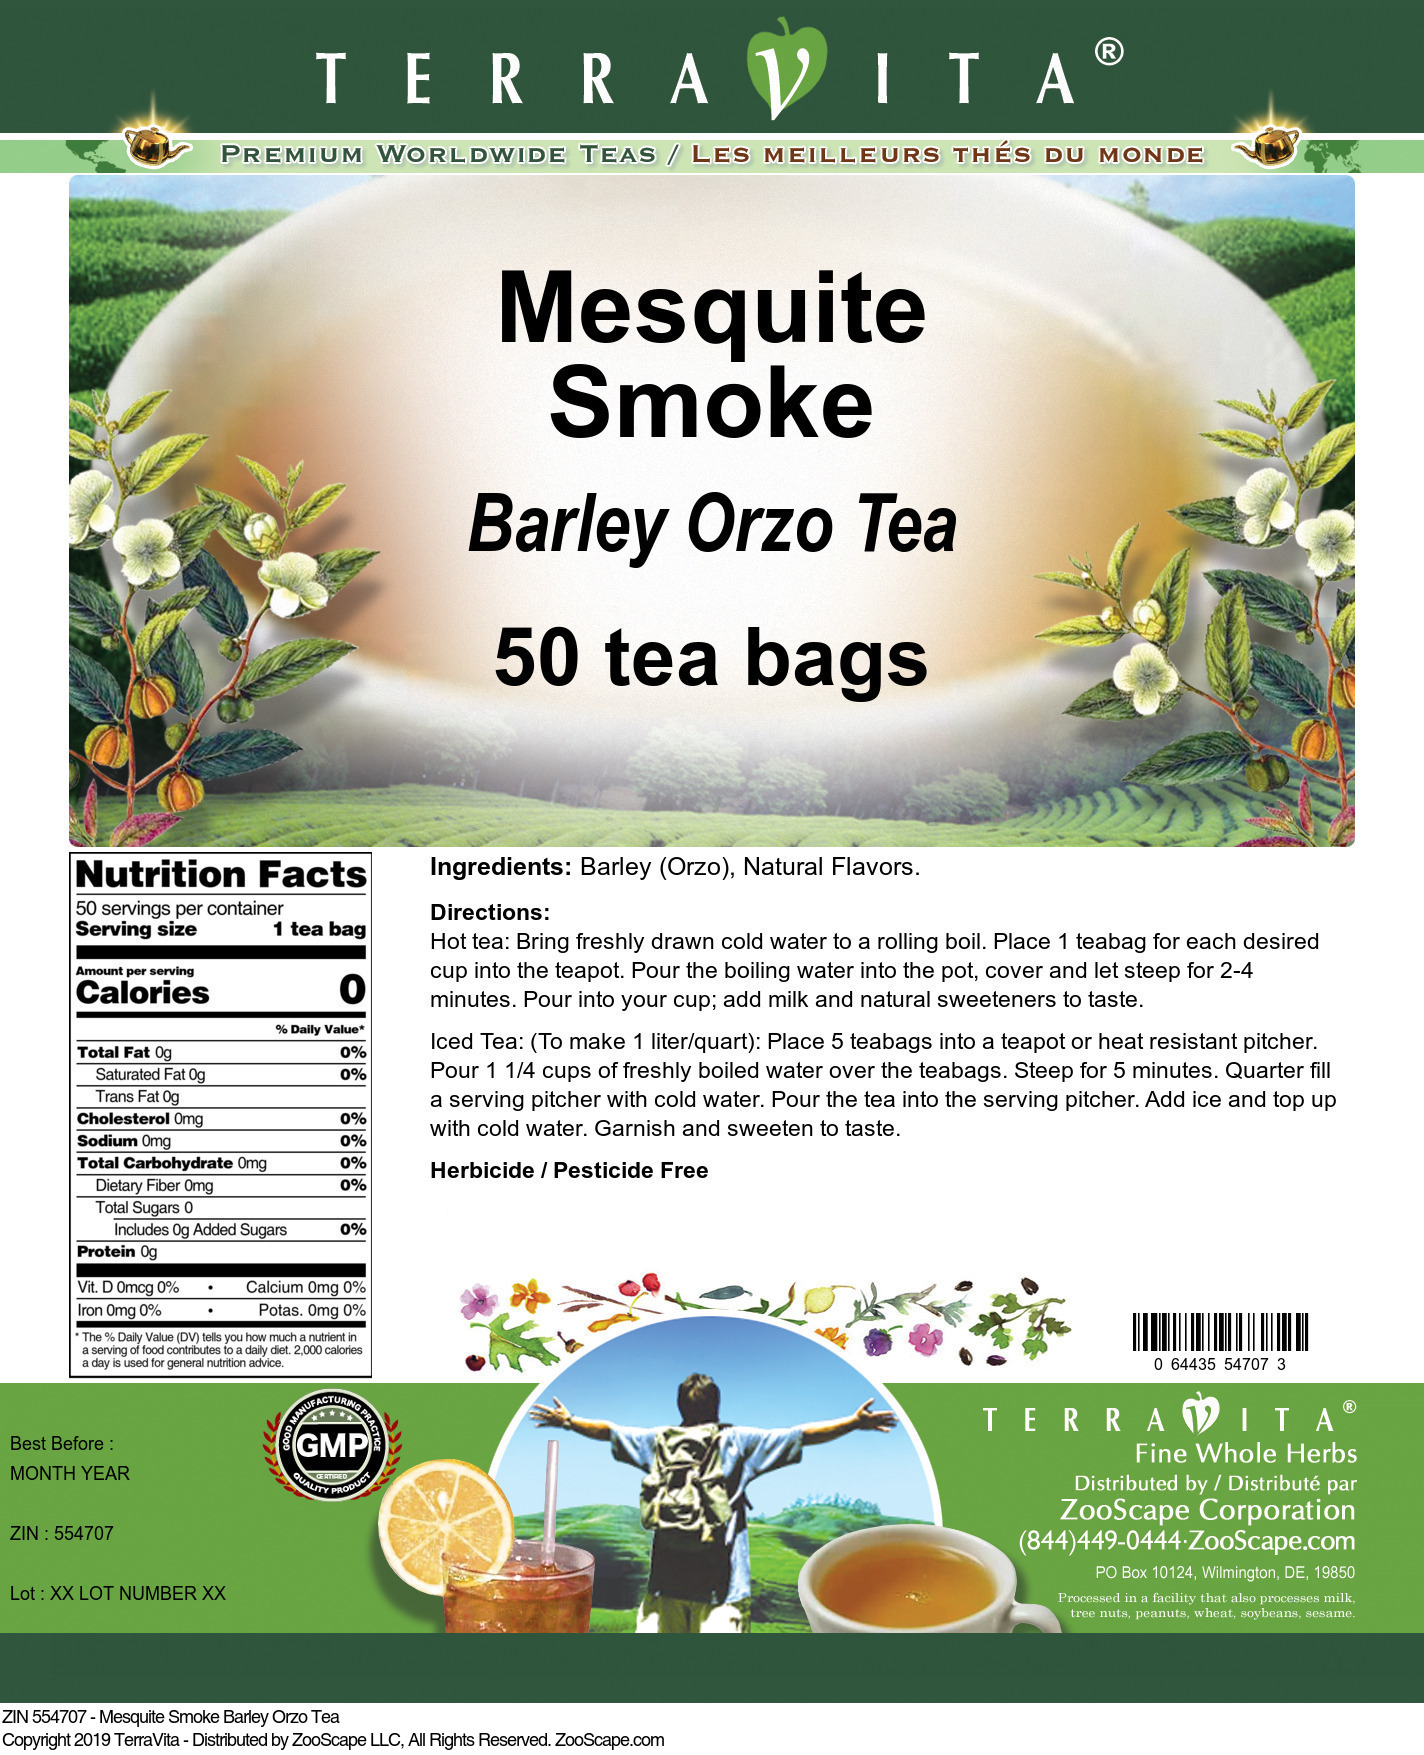 Mesquite Smoke Barley Orzo